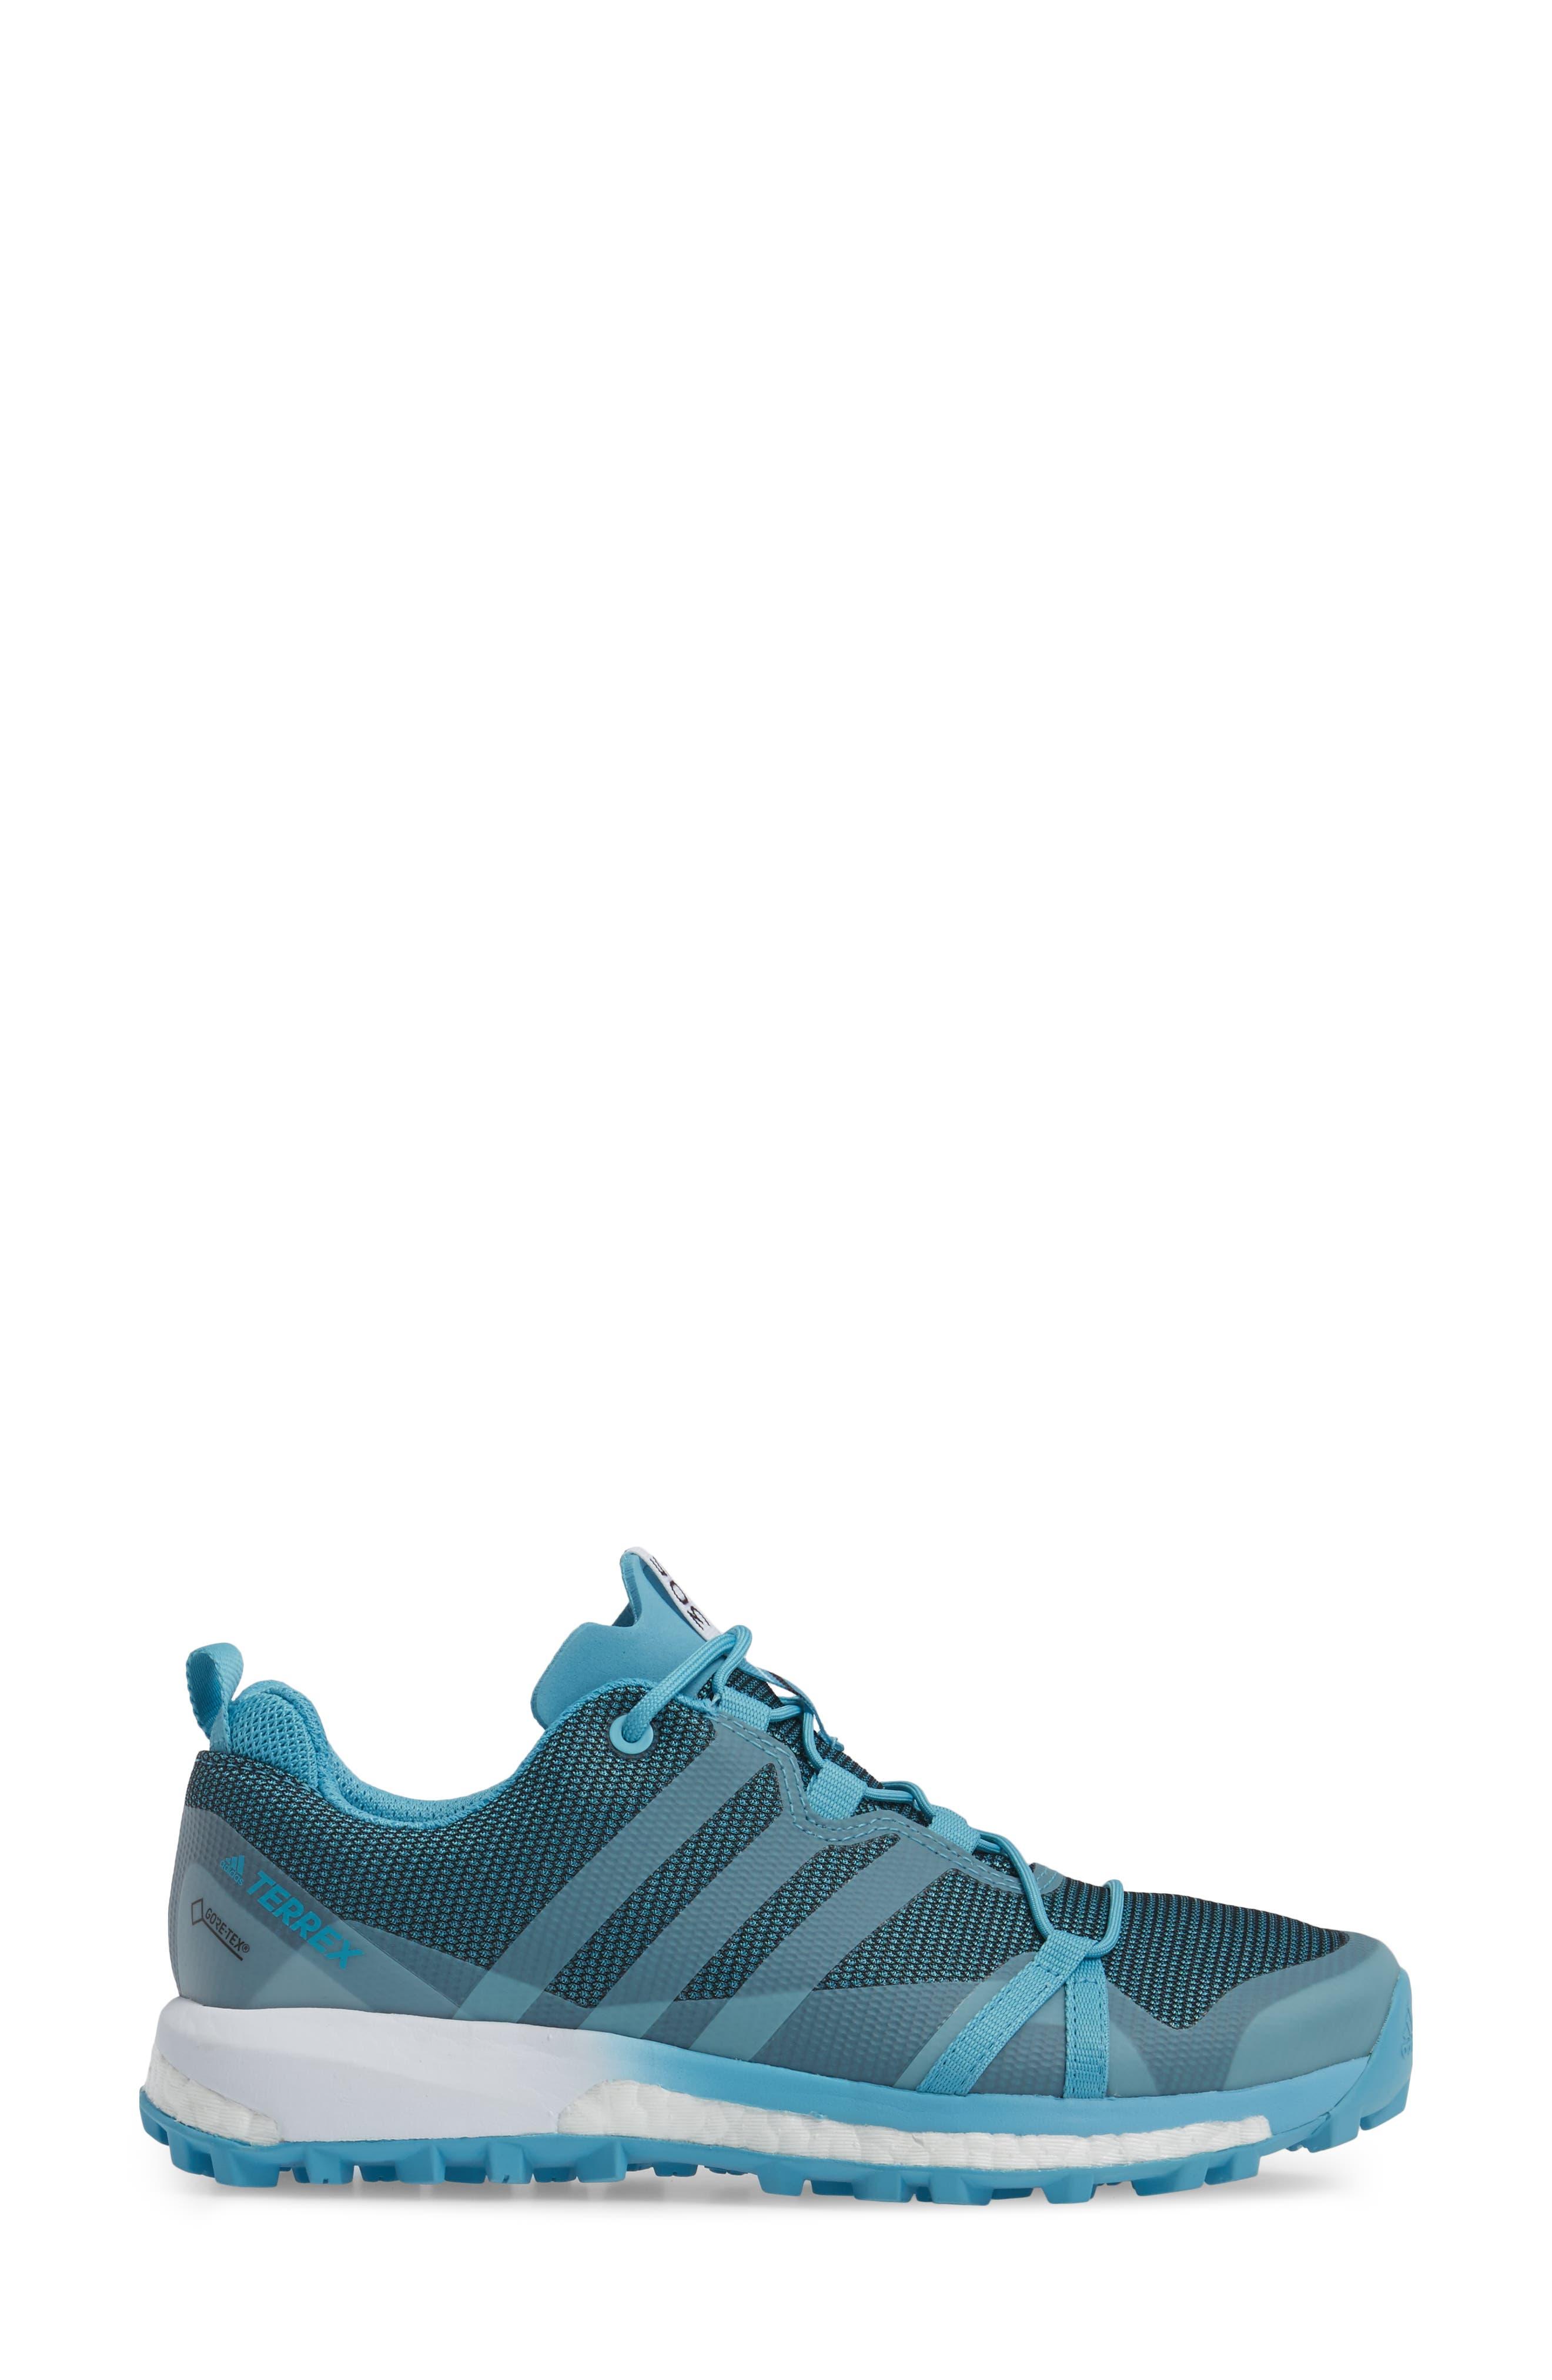 Alternate Image 3  - adidas 'Terrex Agravic GTX' Trail Shoe (Women)